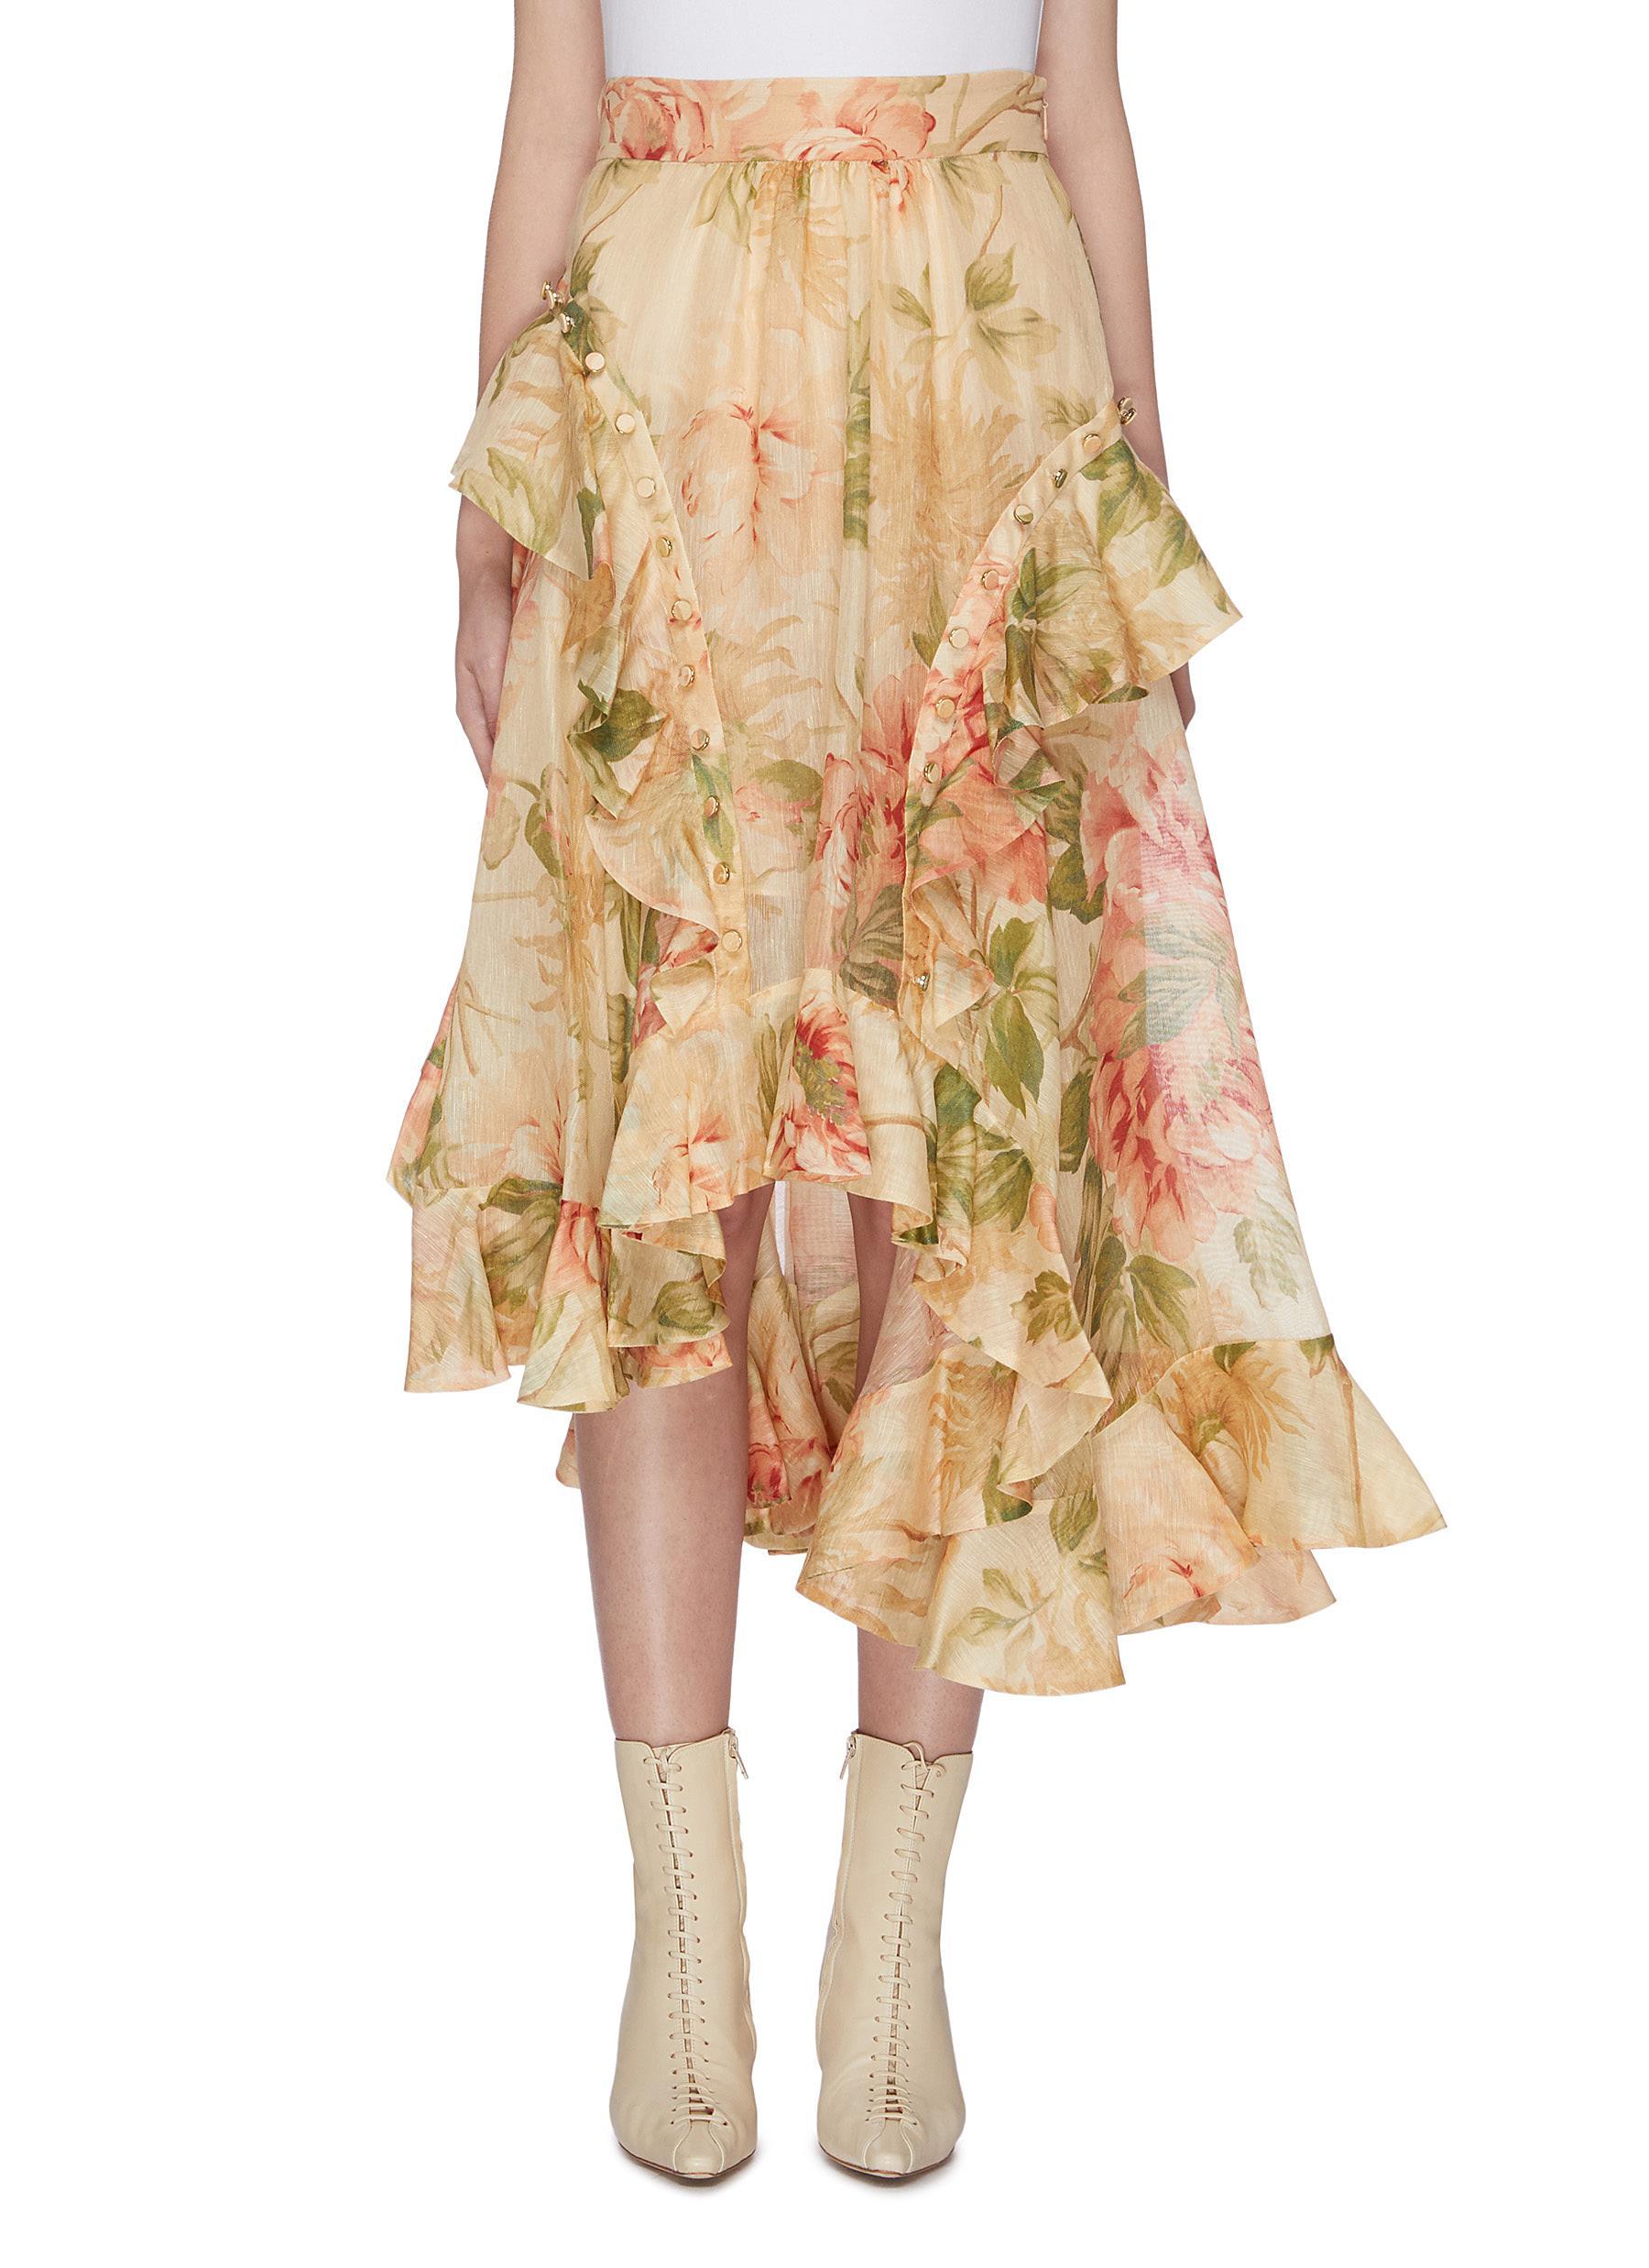 Espionage ruffle trim floral print skirt by Zimmermann